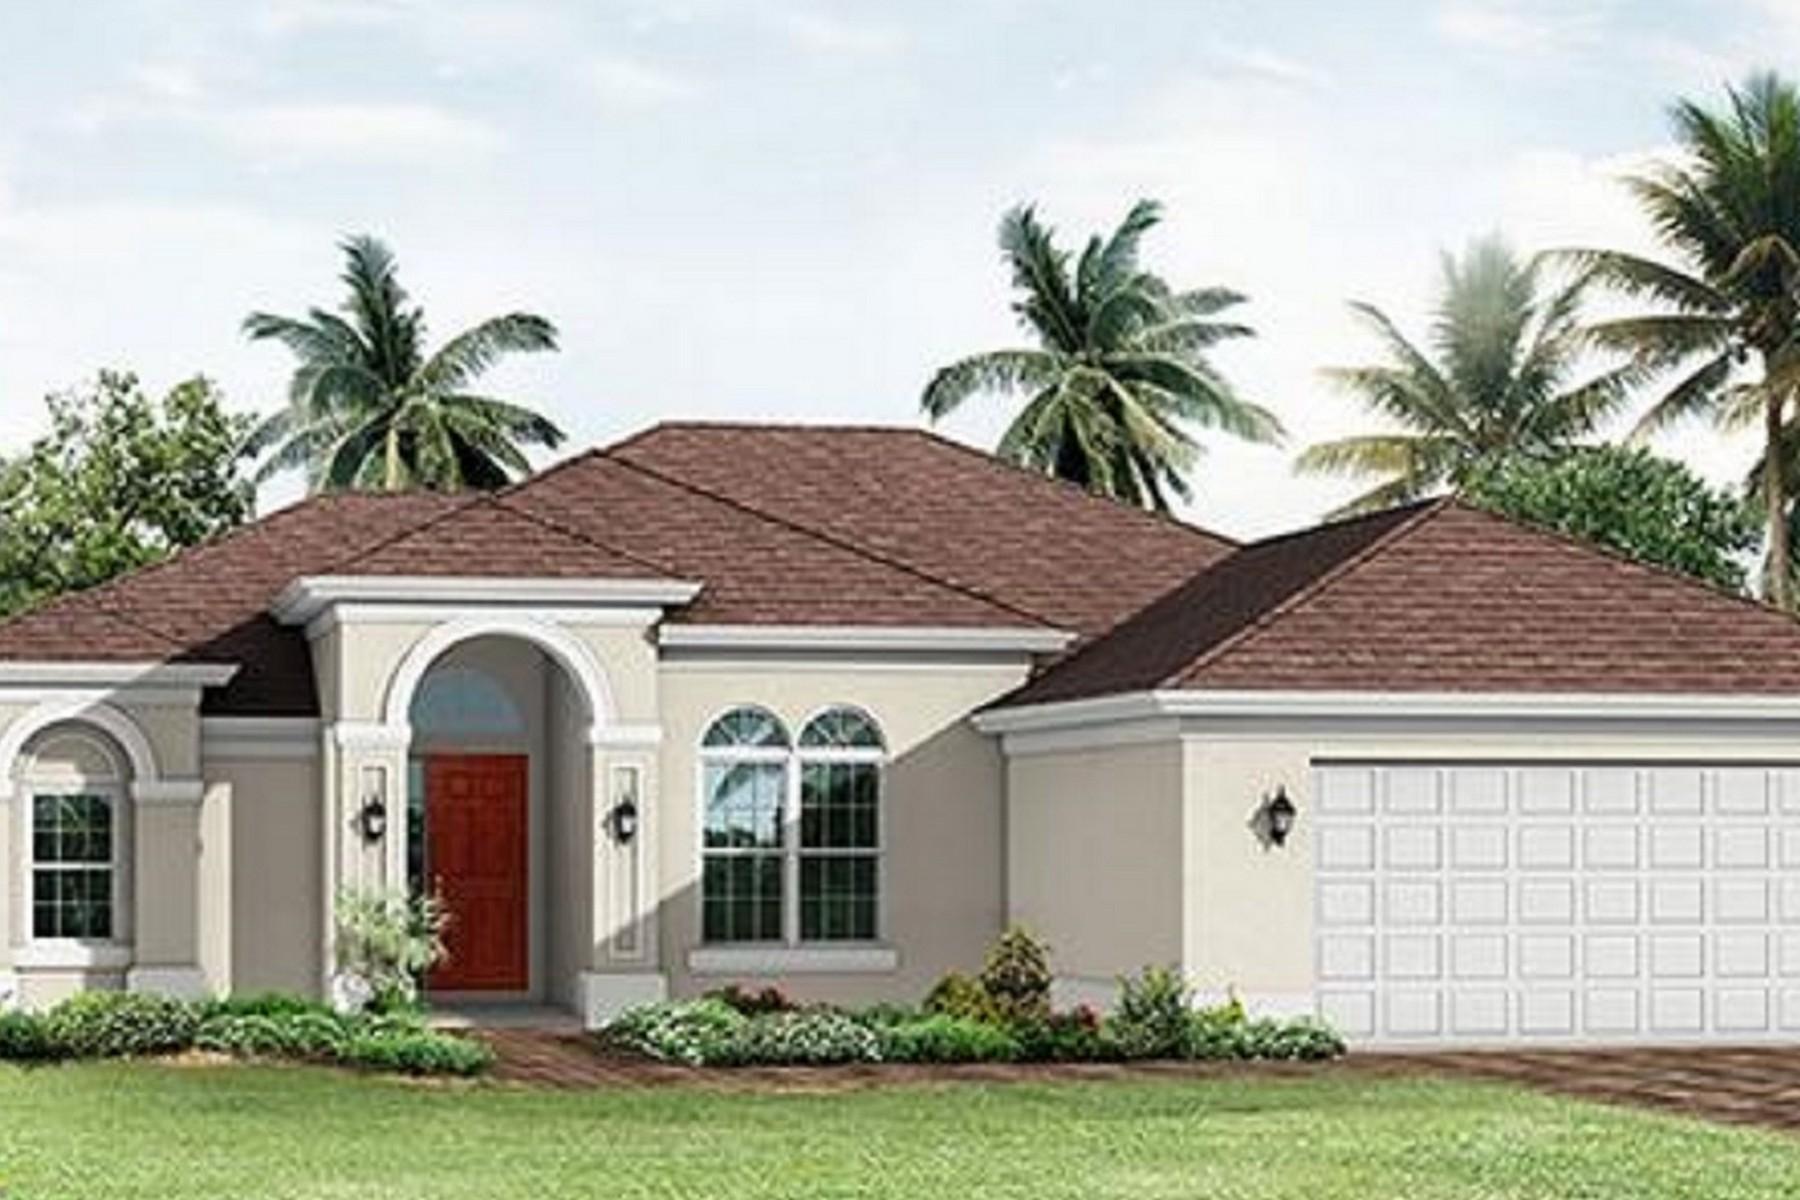 Moradia para Venda às Lovely Home 5812 N Dooley Circle Port St. Lucie, Florida, 34953 Estados Unidos